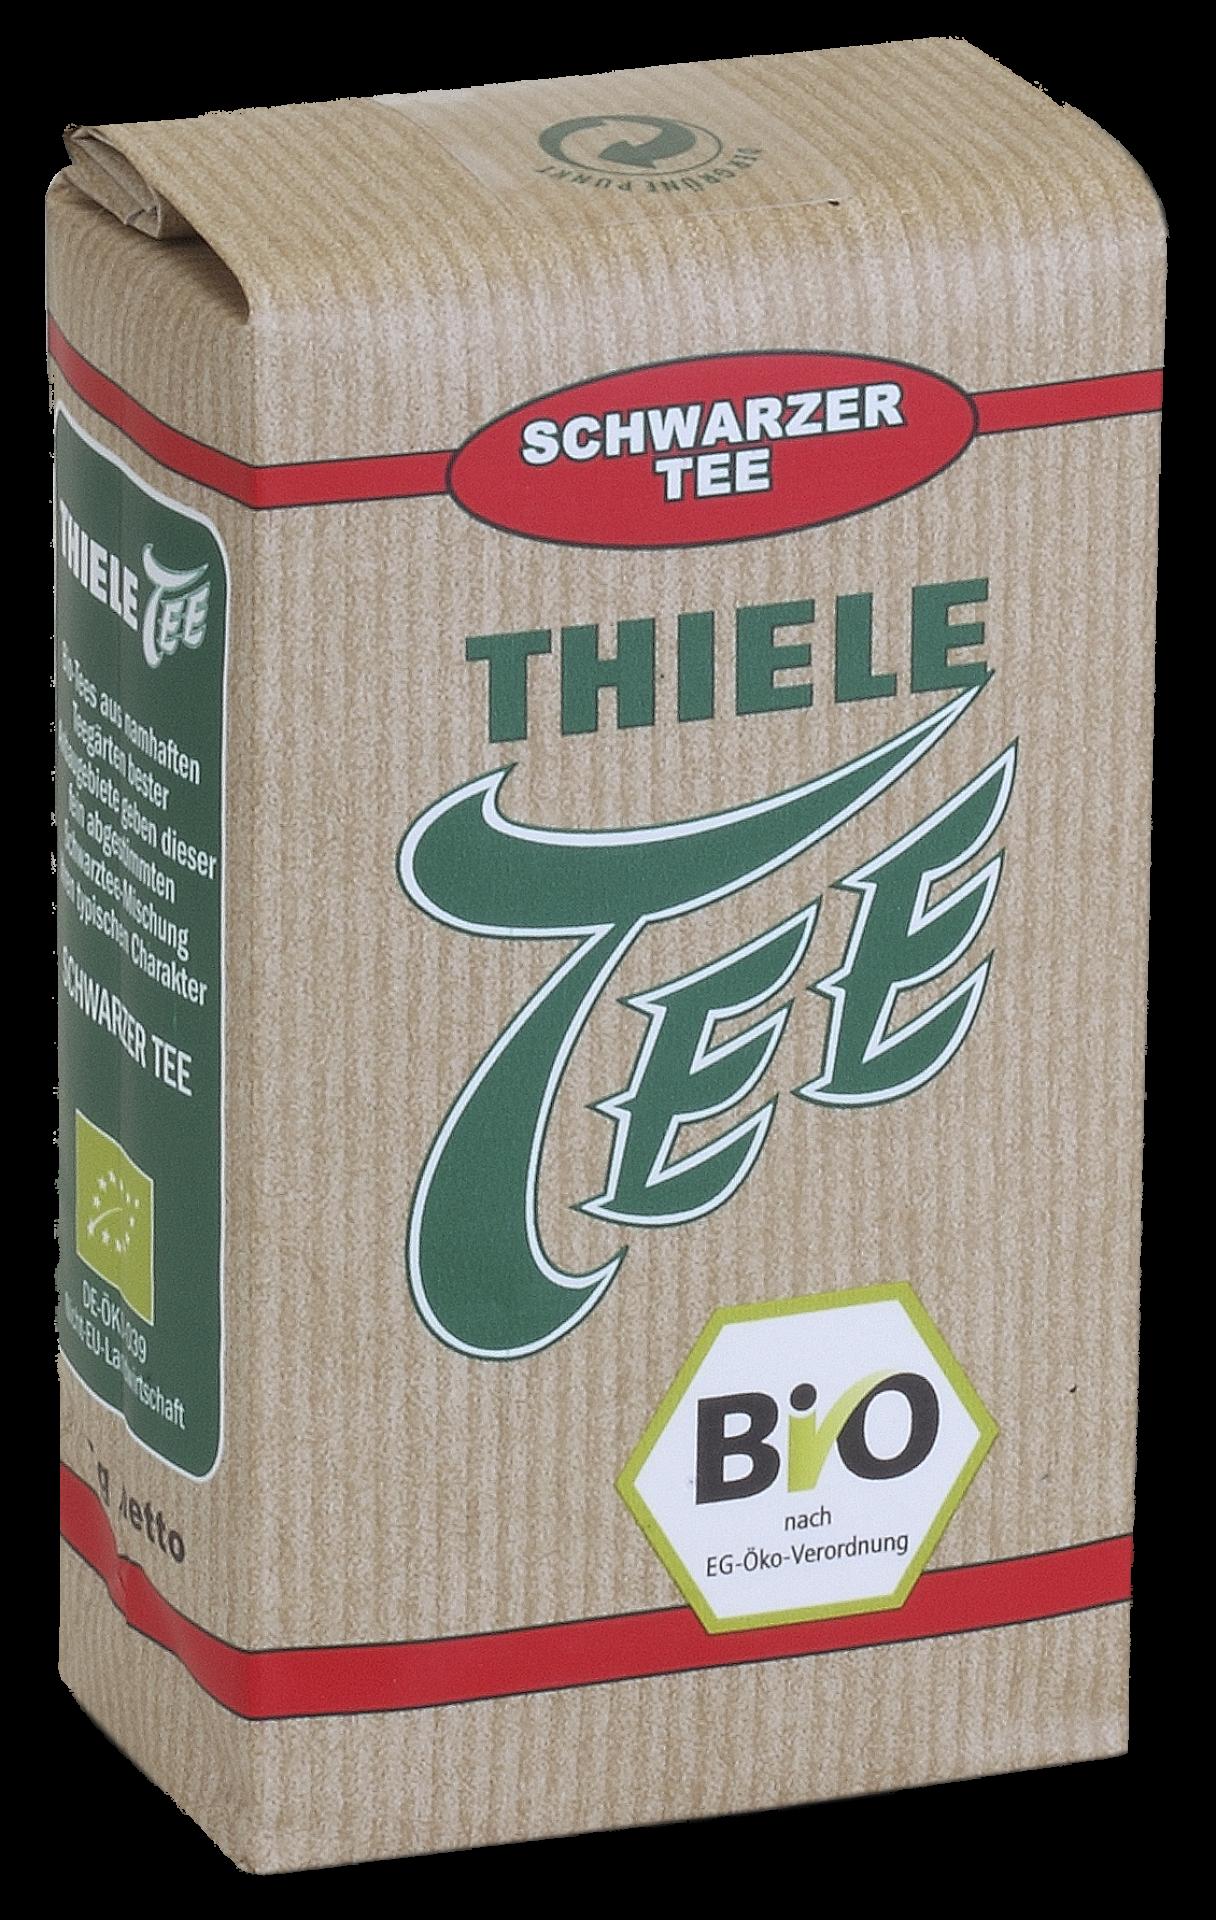 BIO Thiele Tee 125g